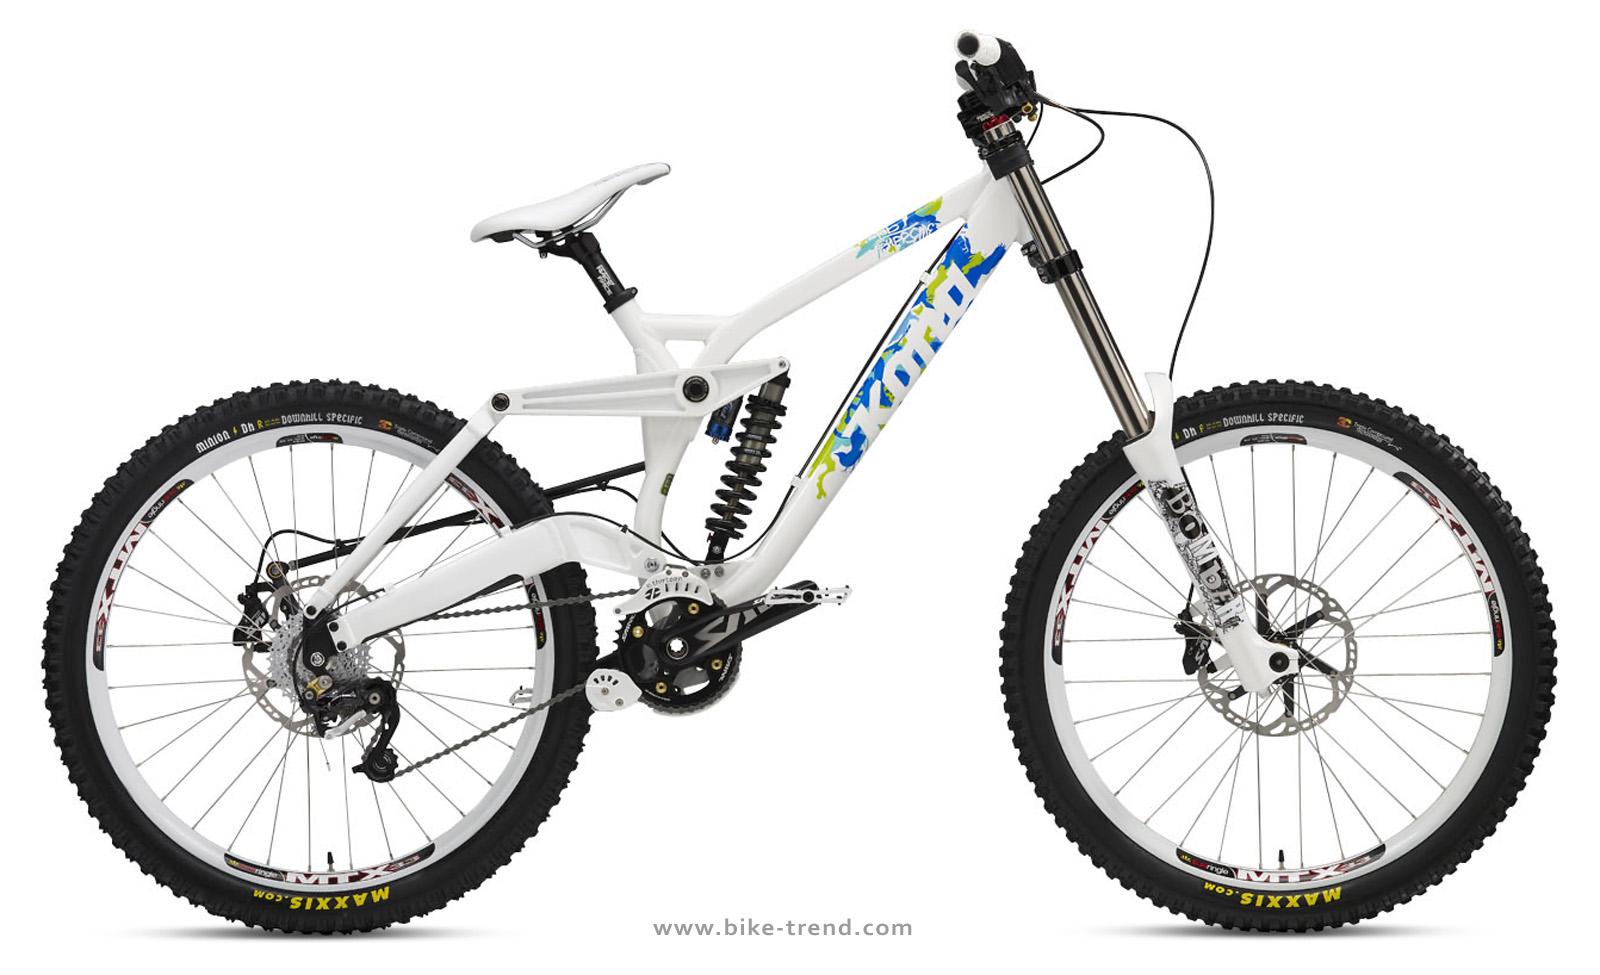 Bikes Kona Kona Downhill Mountain Bikes